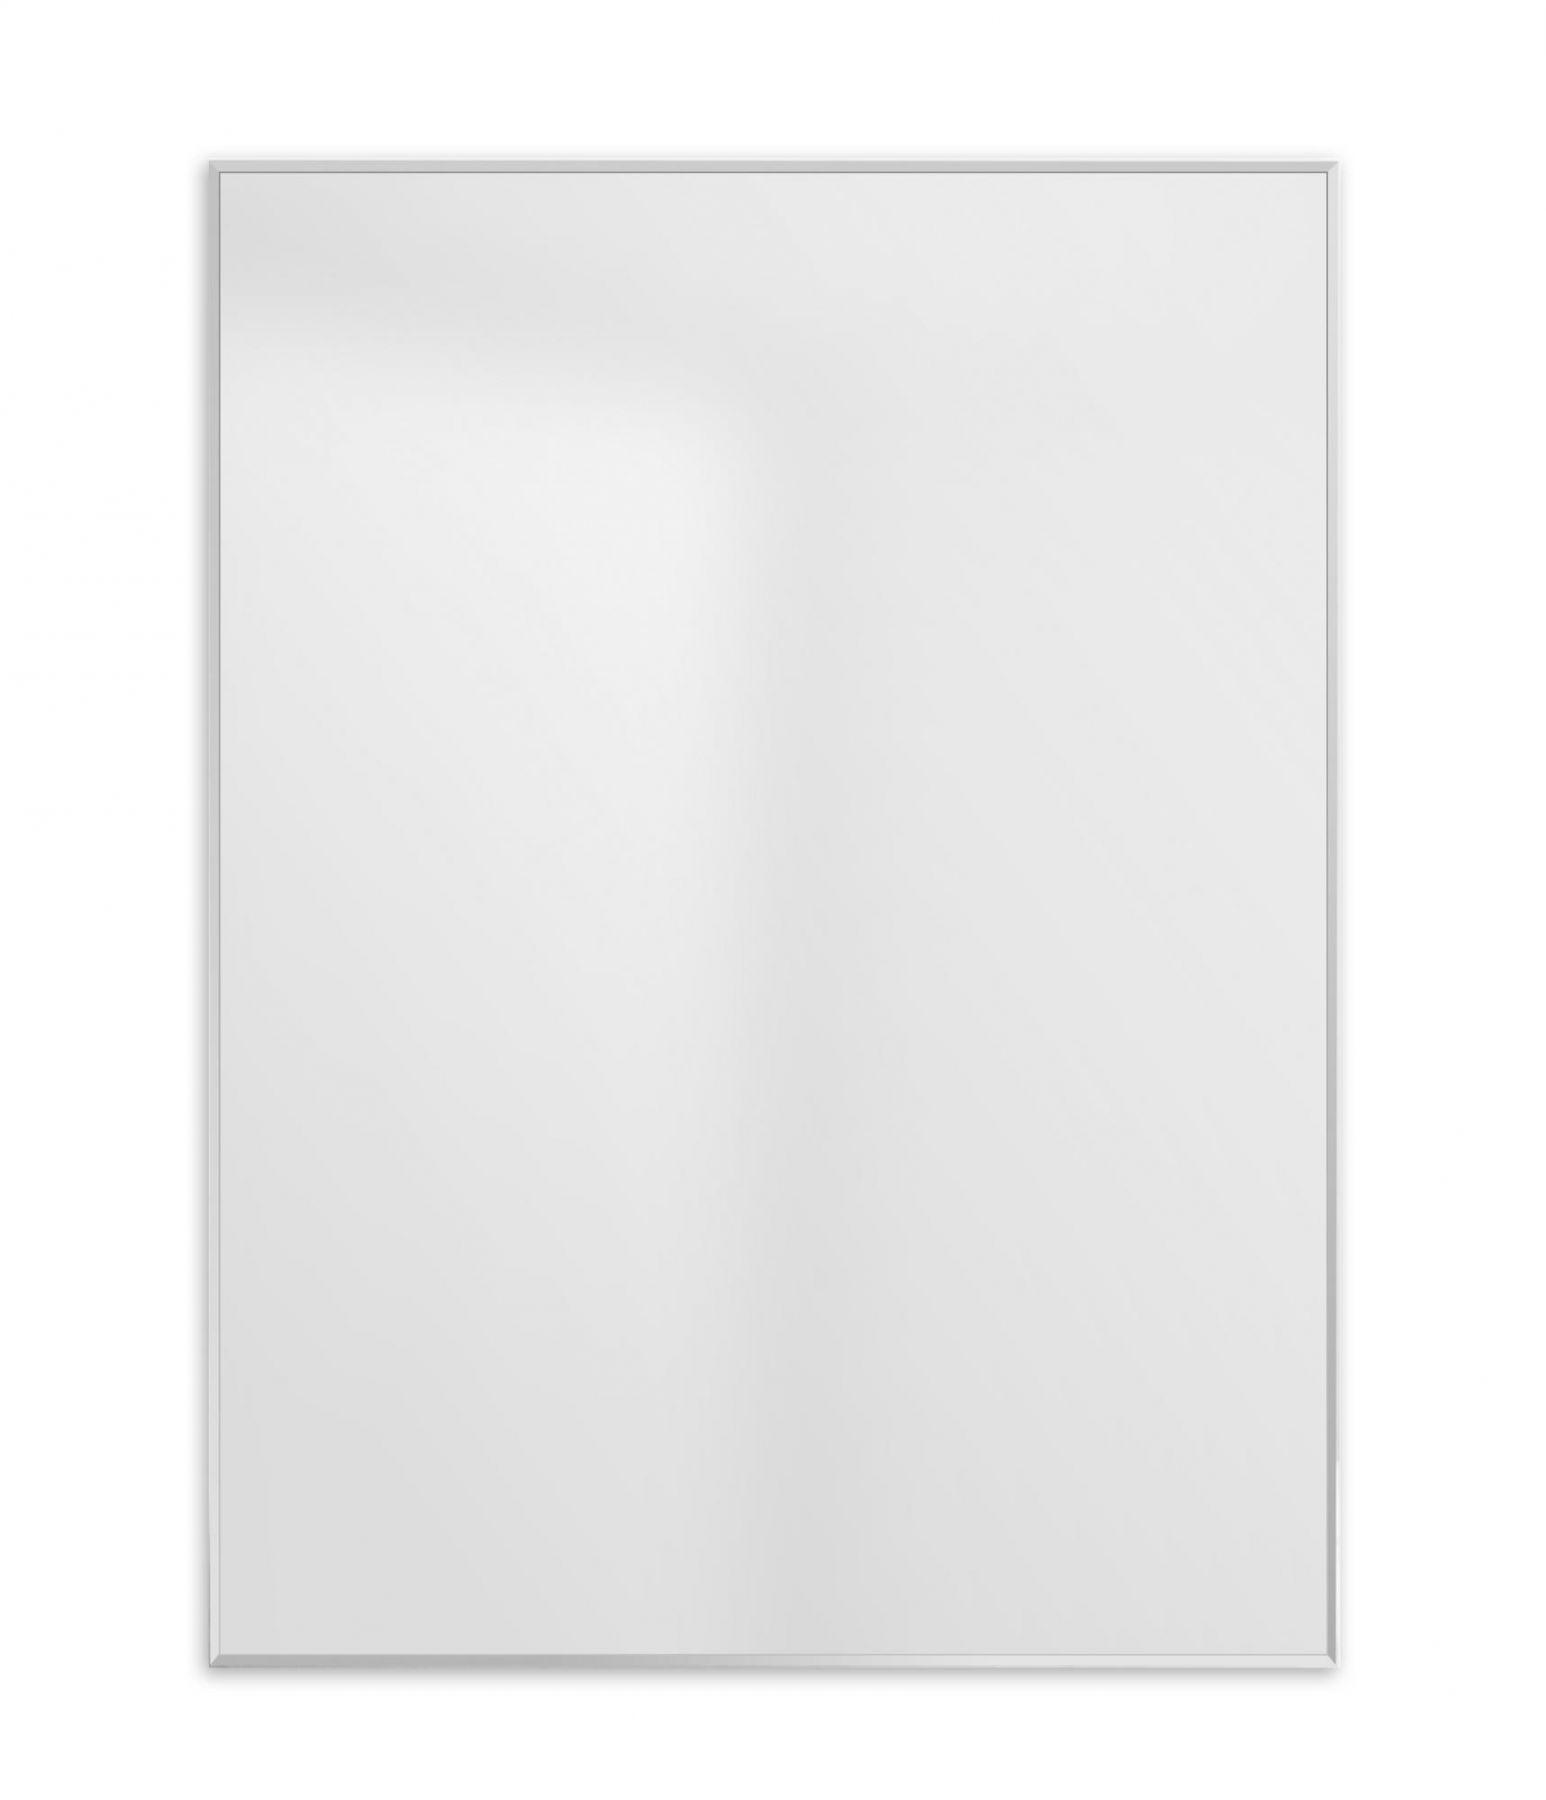 Зеркало для ванной комнаты BelBagno SPC-AL-600-800 ФОТО